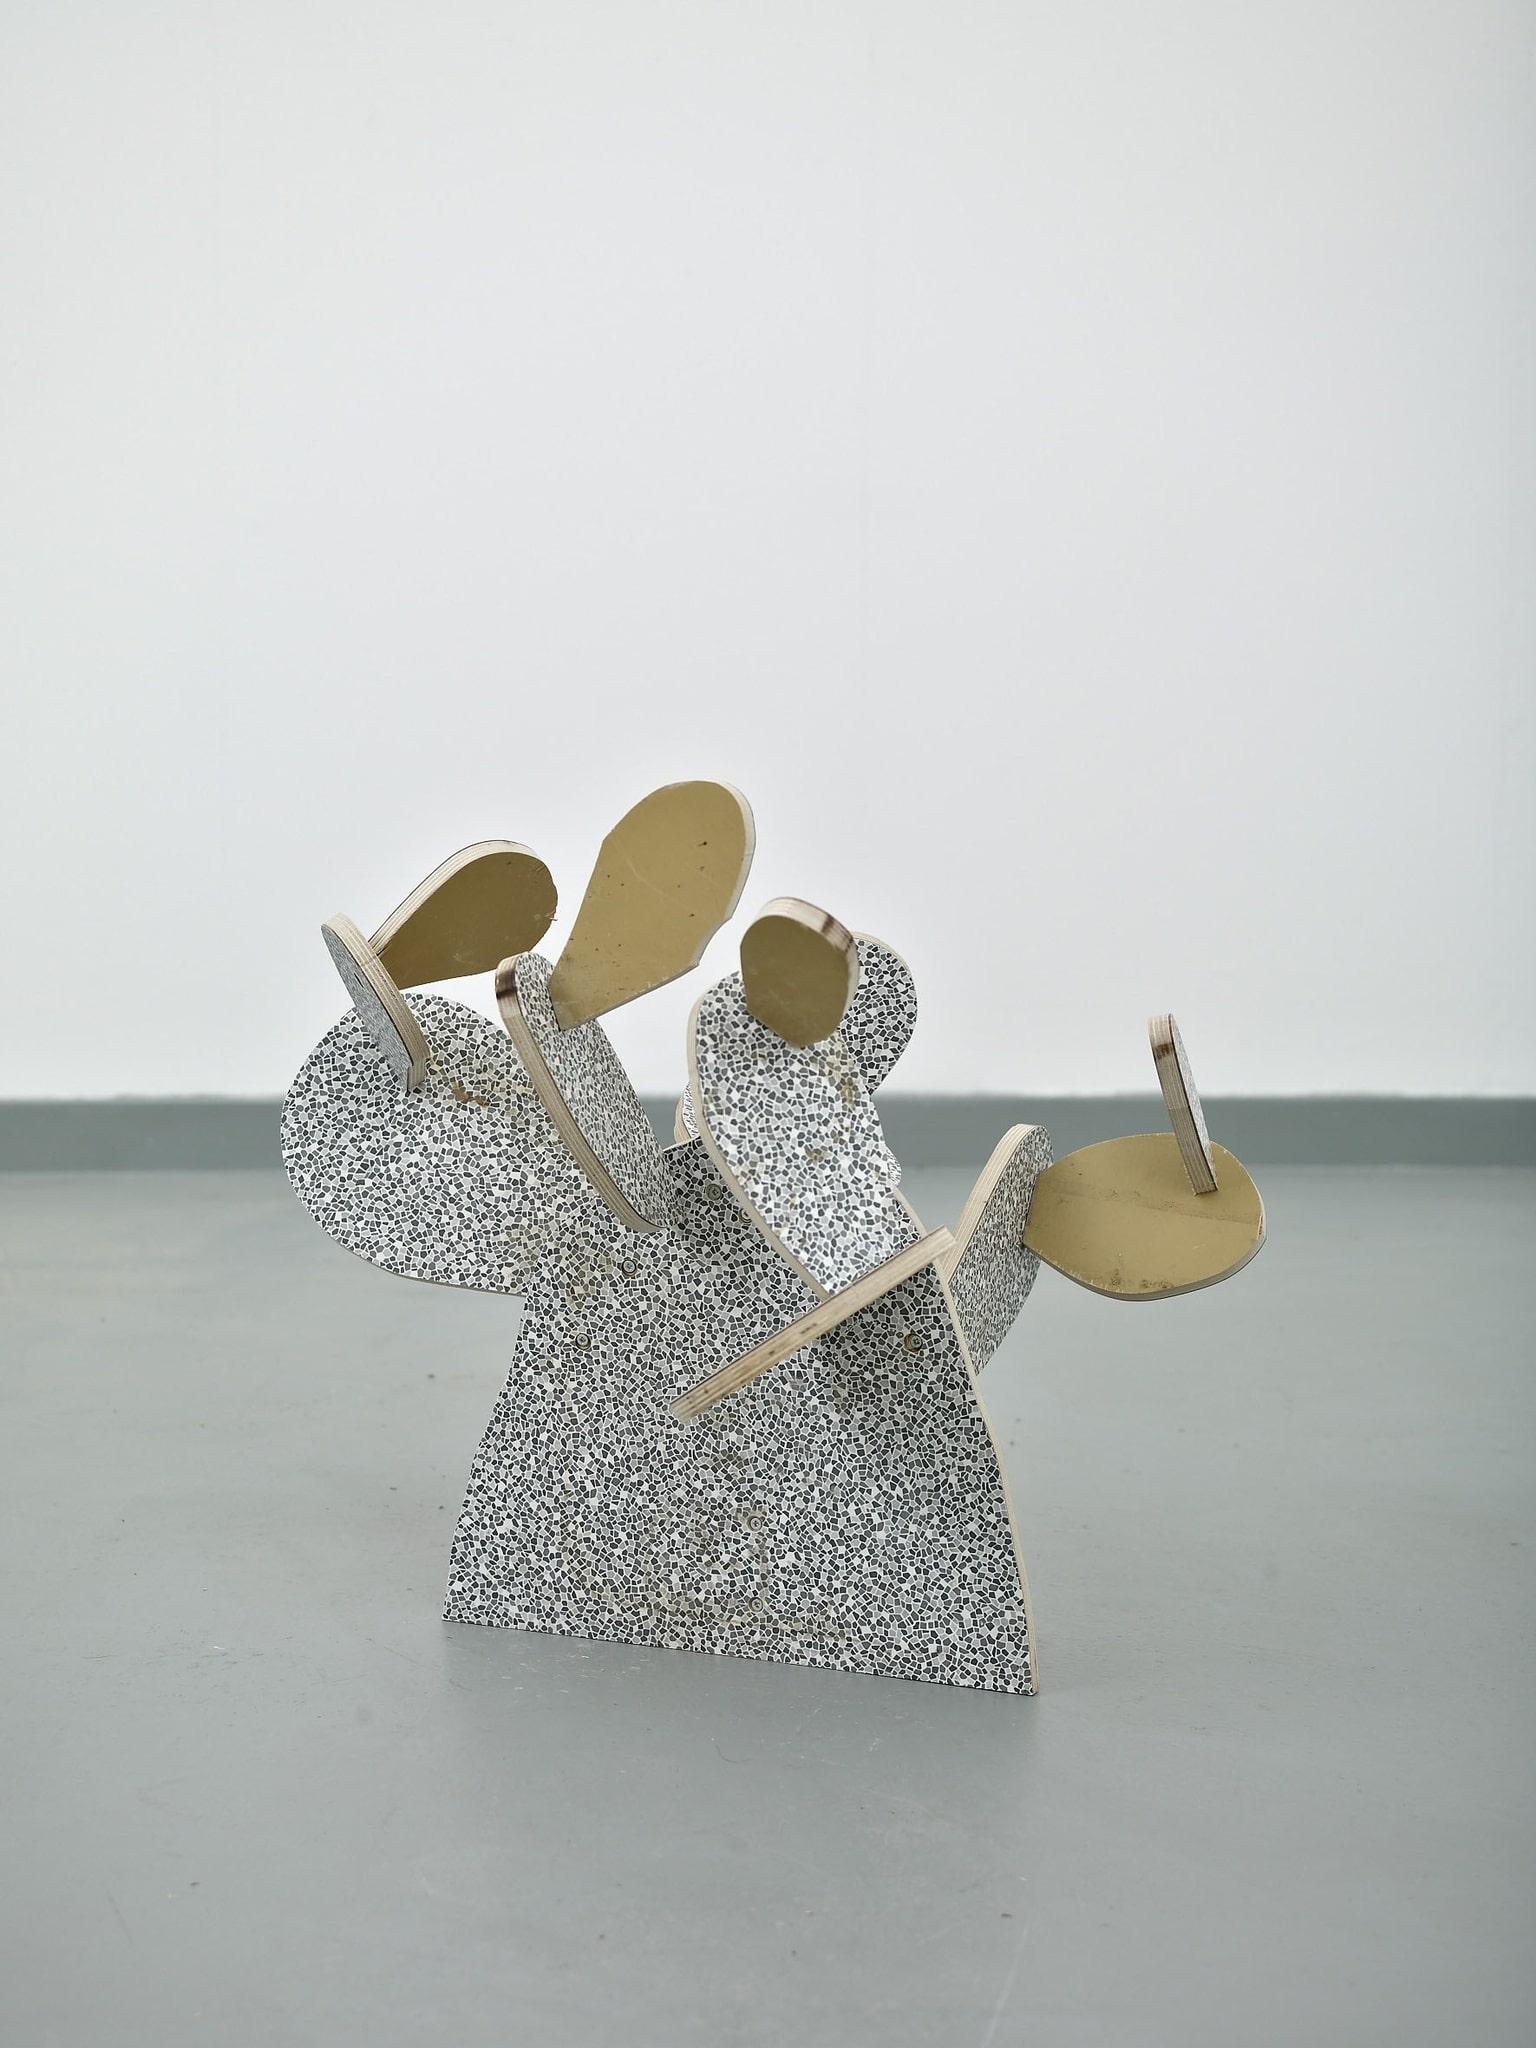 <span class=&#34;link fancybox-details-link&#34;><a href=&#34;/artists/16-paul-merrick/works/8574/&#34;>View Detail Page</a></span><div class=&#34;artist&#34;><strong>Paul Merrick</strong></div> <div class=&#34;title&#34;><em>Cactus (Sabras)</em>, 2014</div> <div class=&#34;medium&#34;>Melamine</div> <div class=&#34;dimensions&#34;>52 x 60 x 53 cm<br />20 1/2 x 23 5/8 x 20 7/8 in</div><div class=&#34;copyright_line&#34;>Copyright The Artist</div>